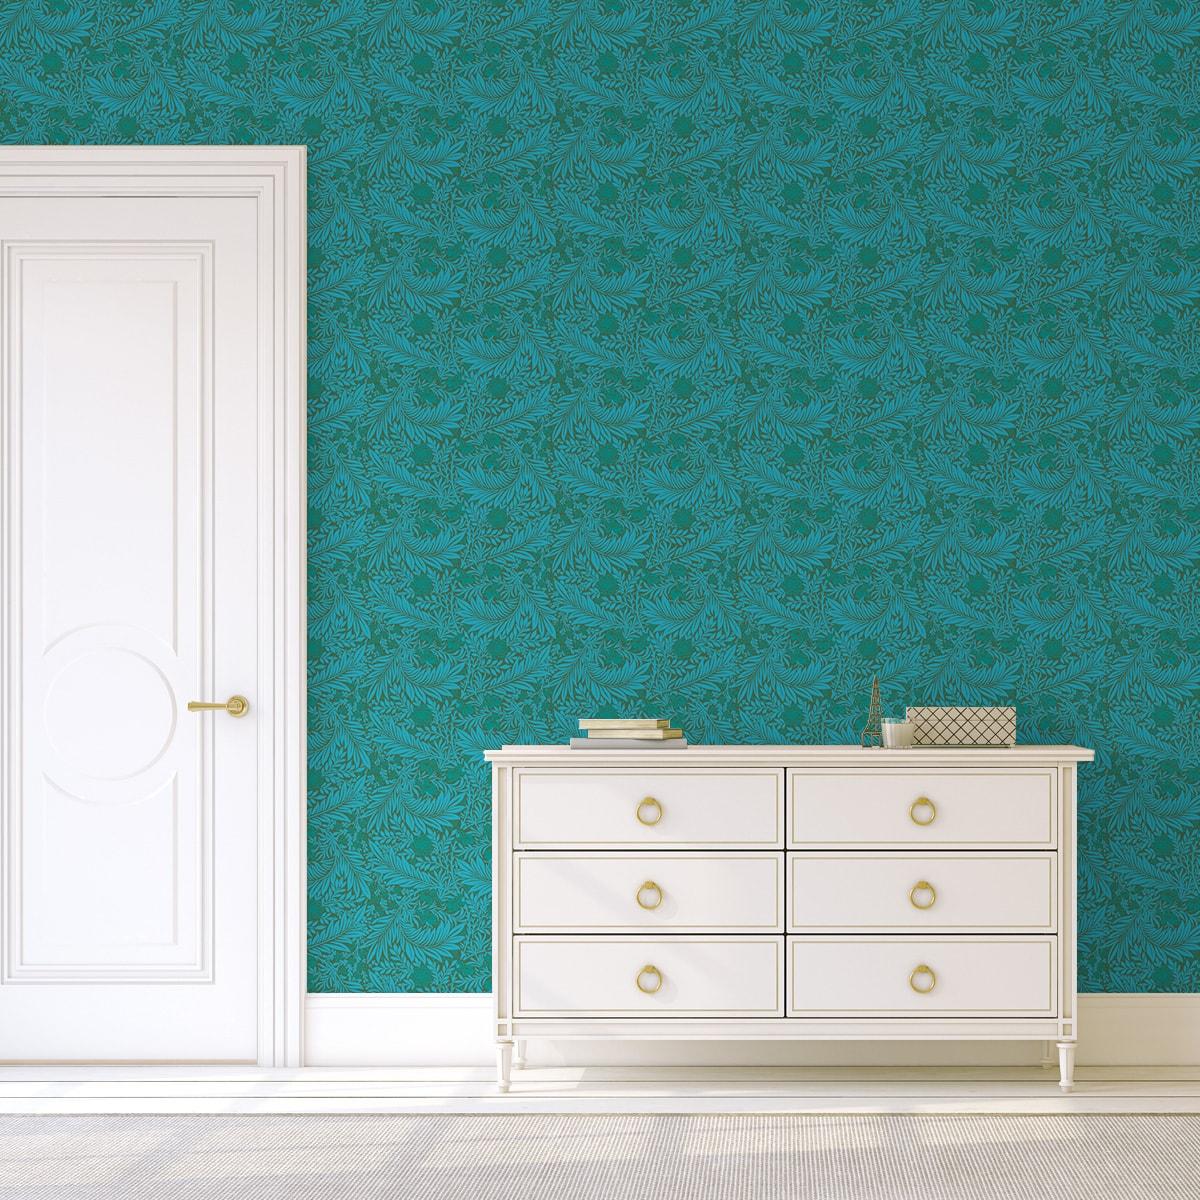 Tapete Wohnzimmer grün: Edle William Morris Jugendstil Tapete